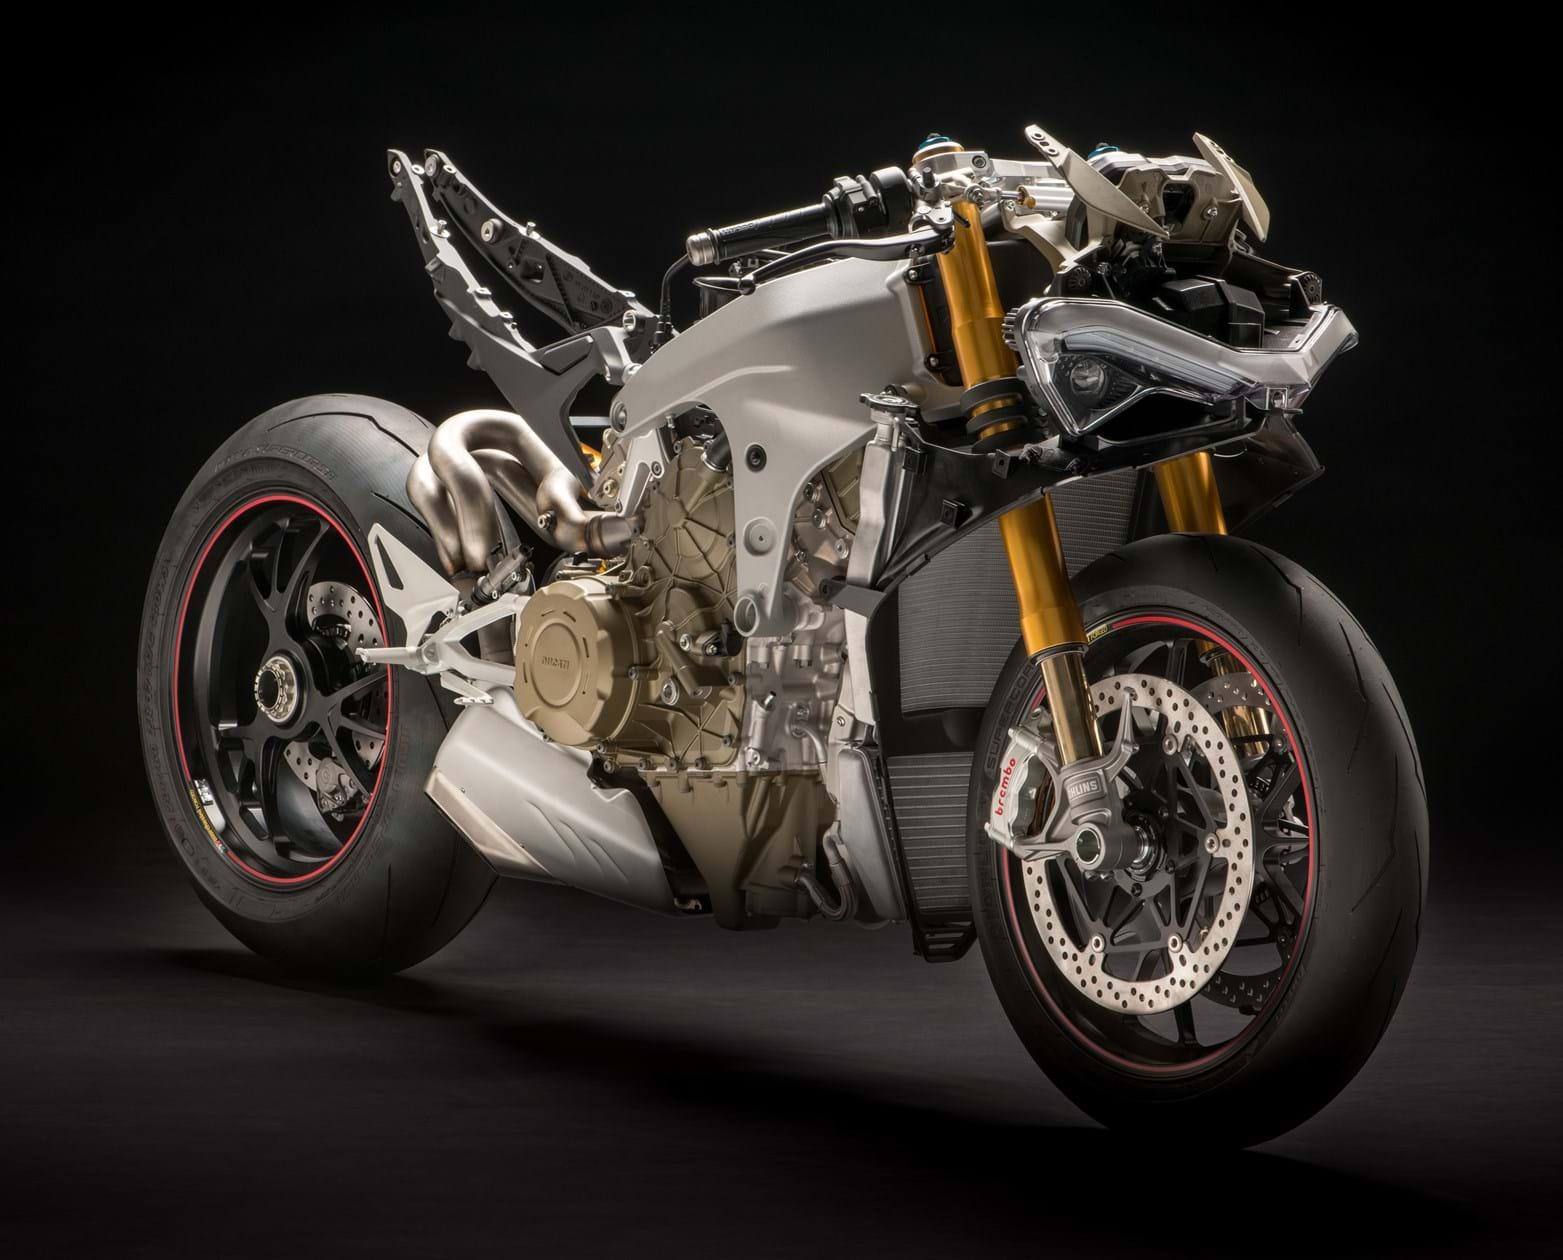 For Sale Ducati Panigale V4 S The Bike Market